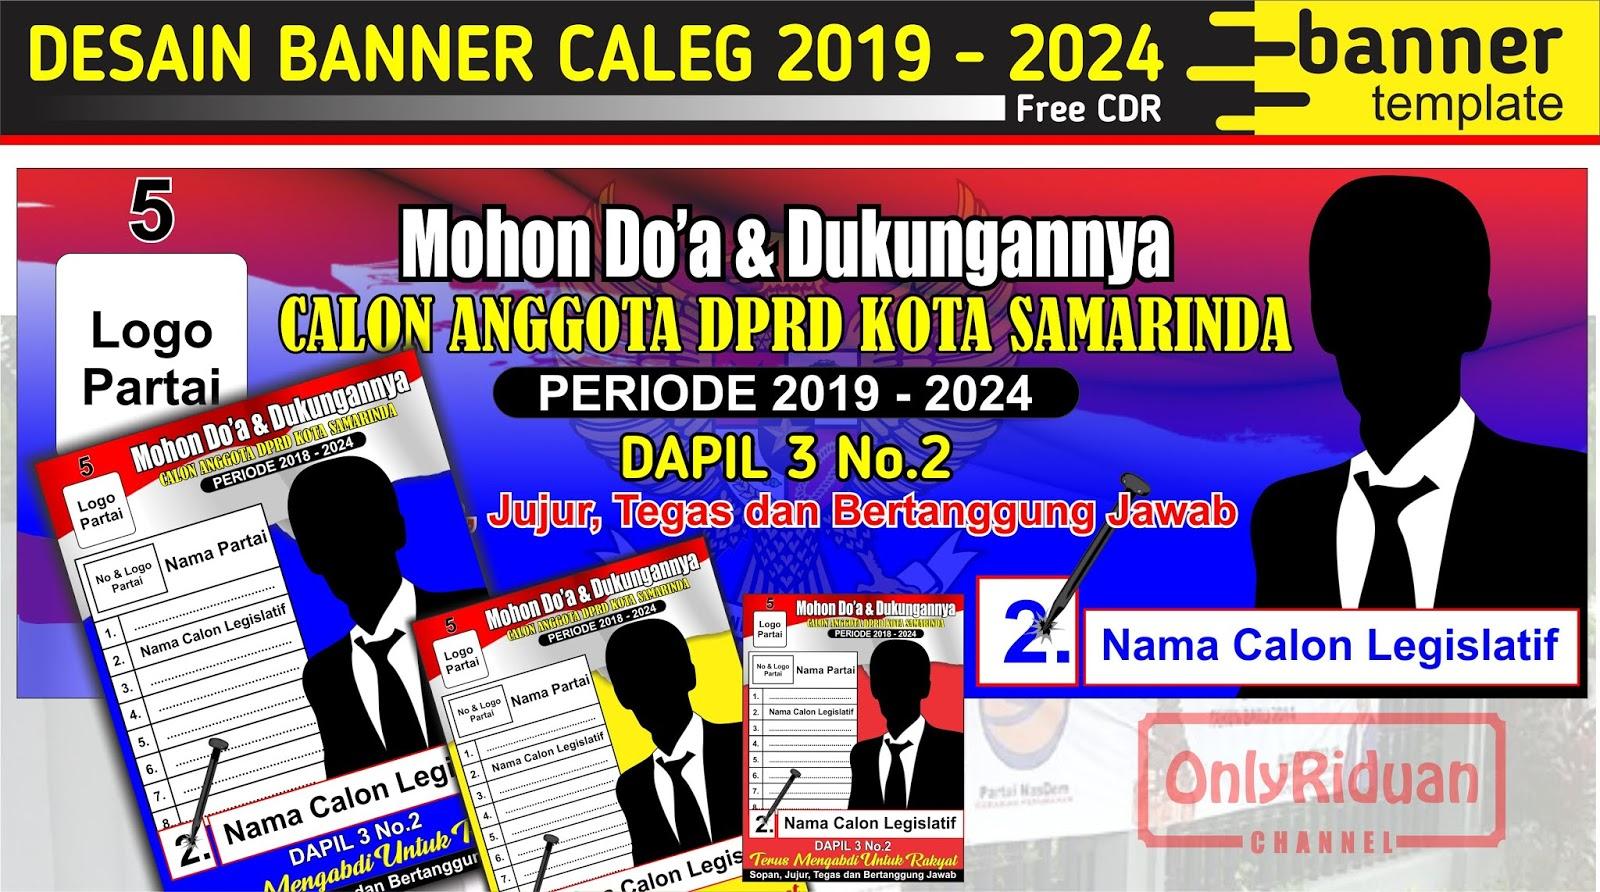 Desain Banner Caleg 2019-2024 (Template Banner ...